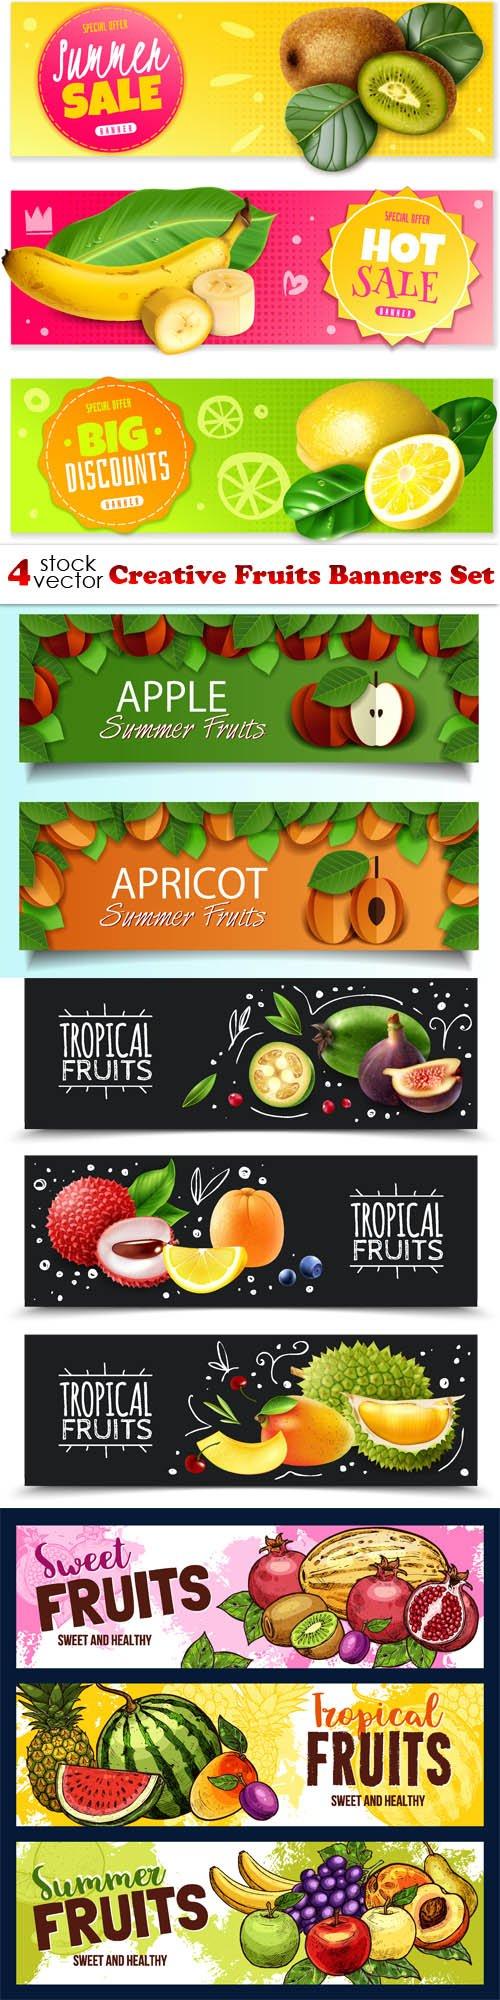 Vectors - Creative Fruits Banners Set